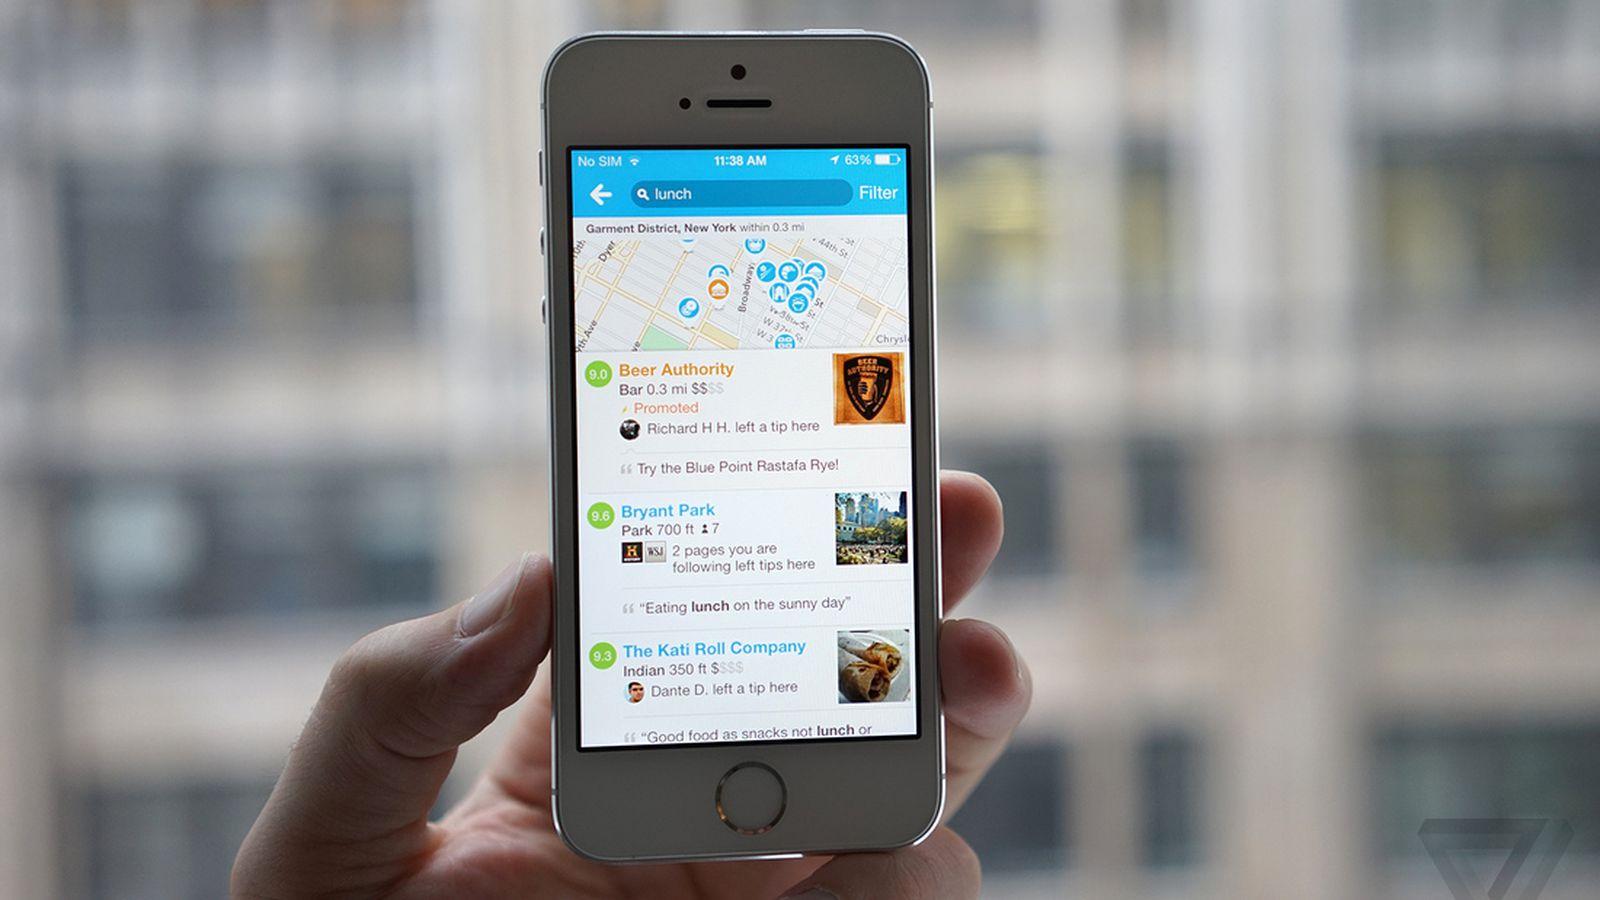 Redes sociales para restaurantes foursquare